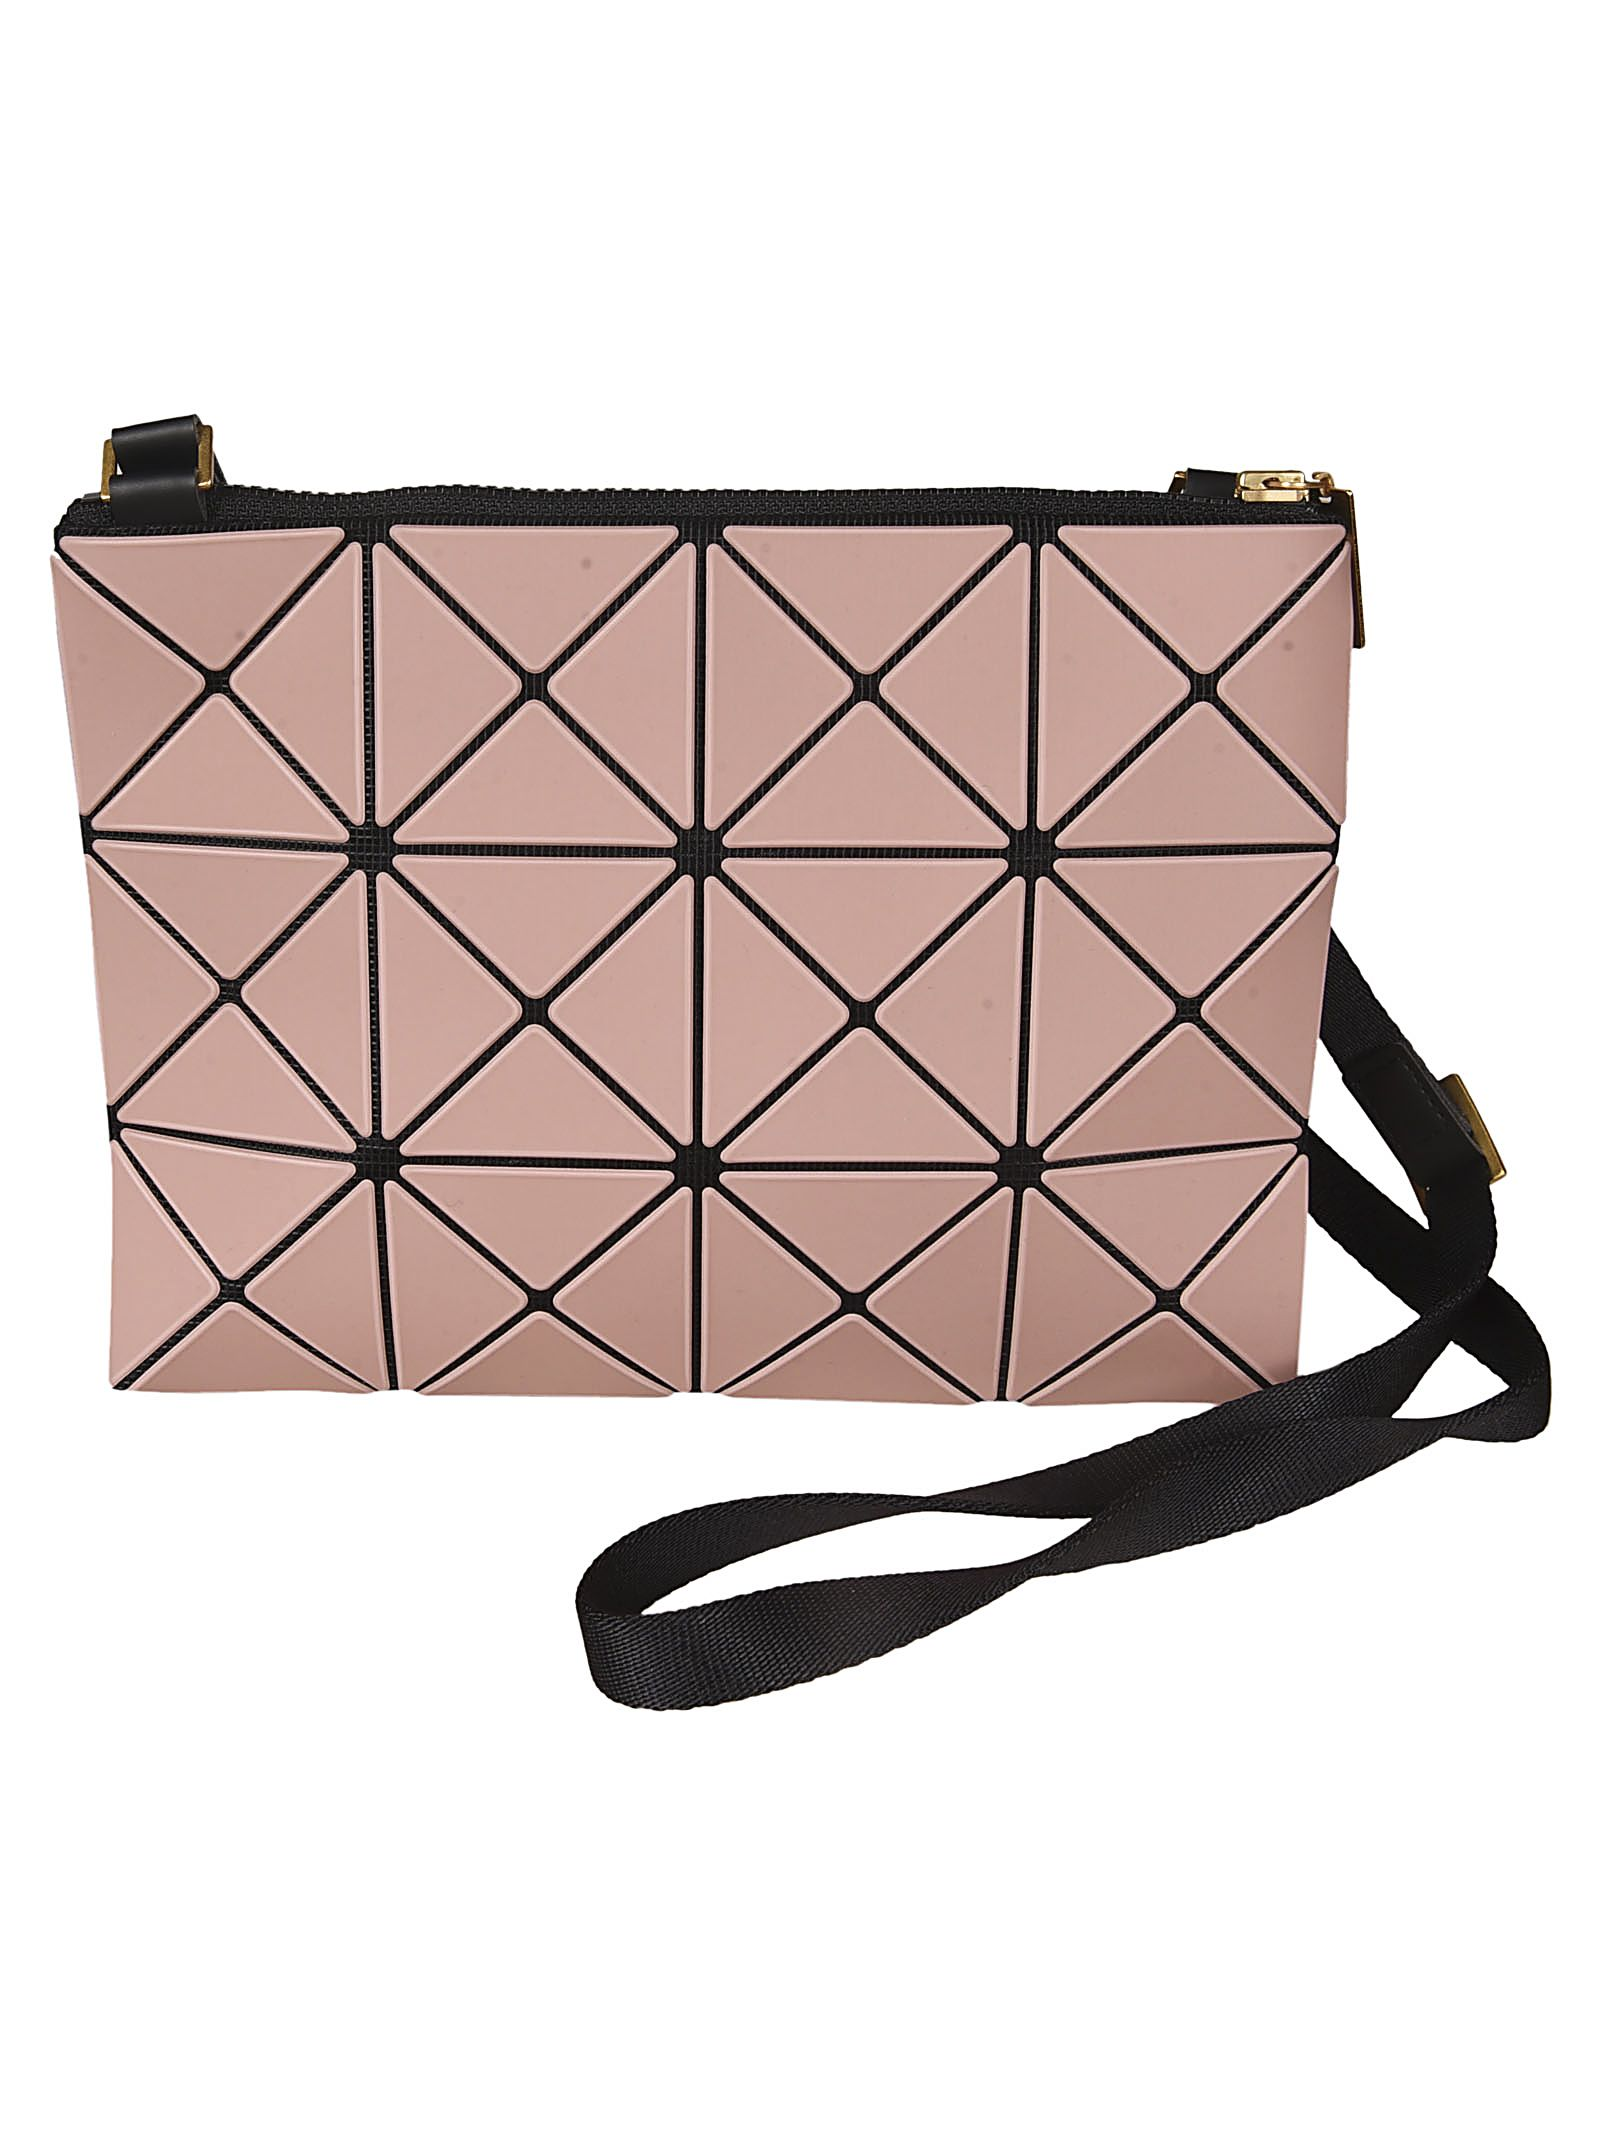 Bao Bao Issey Miyake Lucent Frost Shoulder Bag